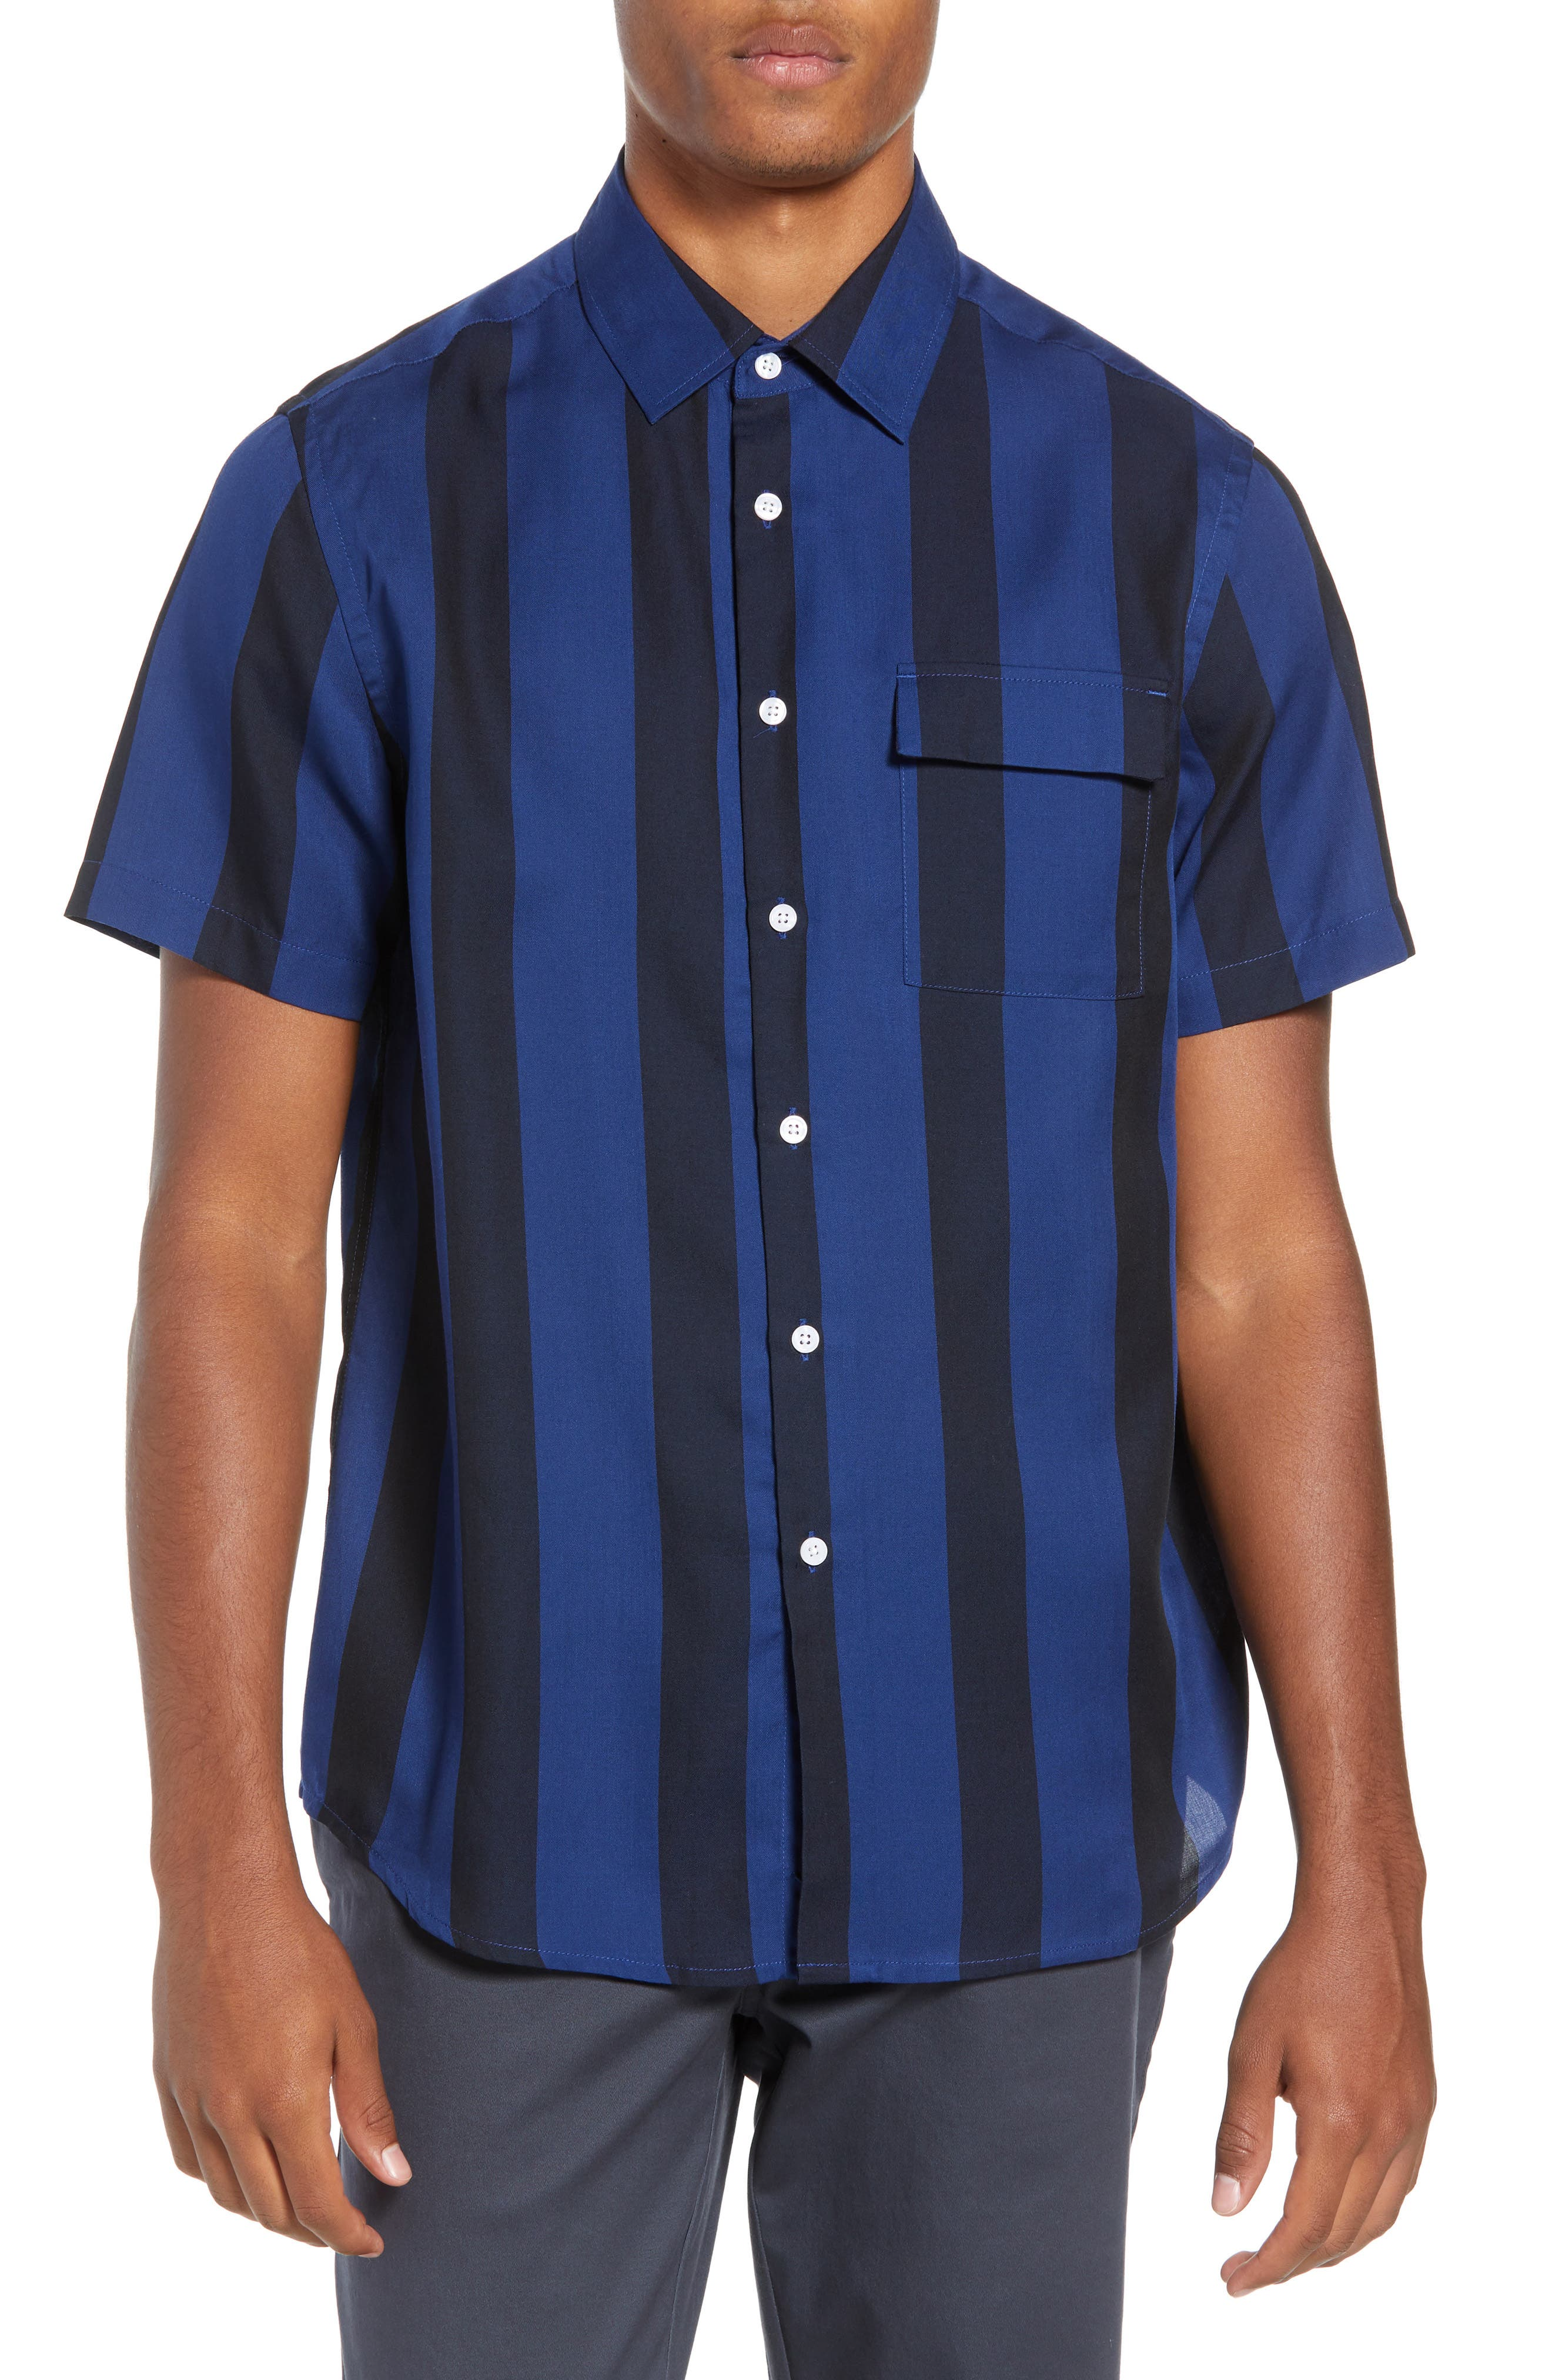 SATURDAYS NYC Saturdays Nico Broad Stripe Woven Shirt, Main, color, 001